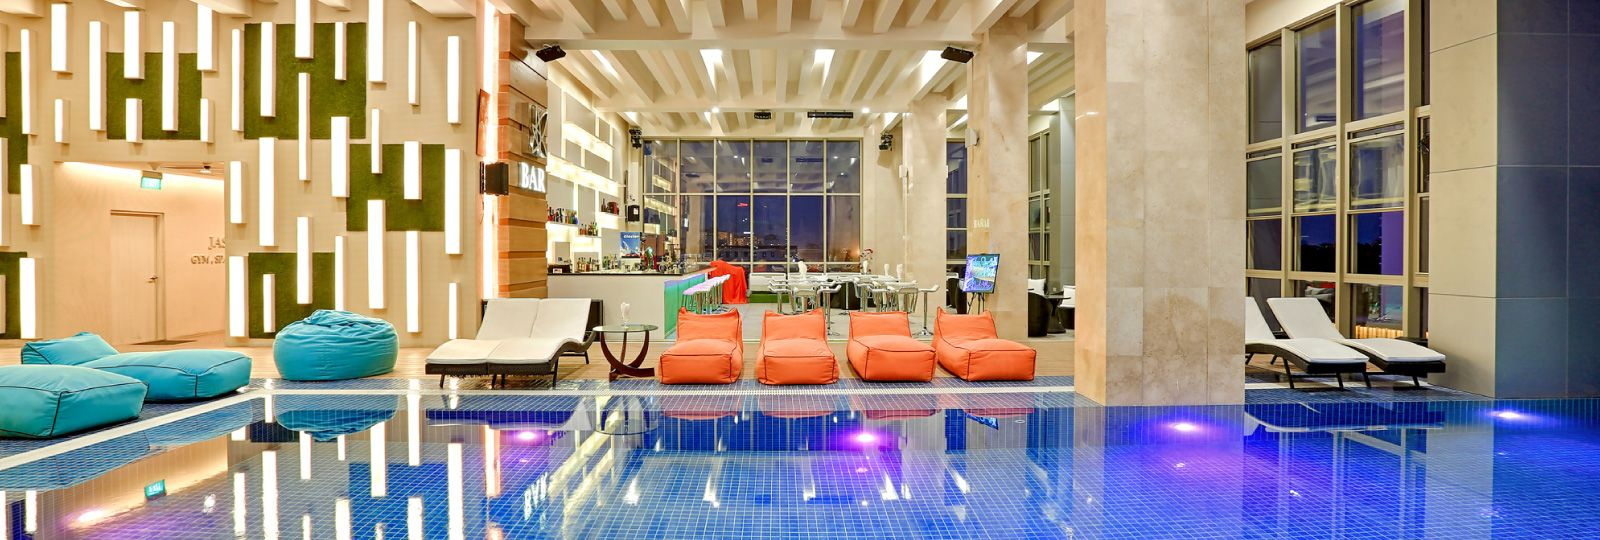 Luxury boutique hotel in rangoon